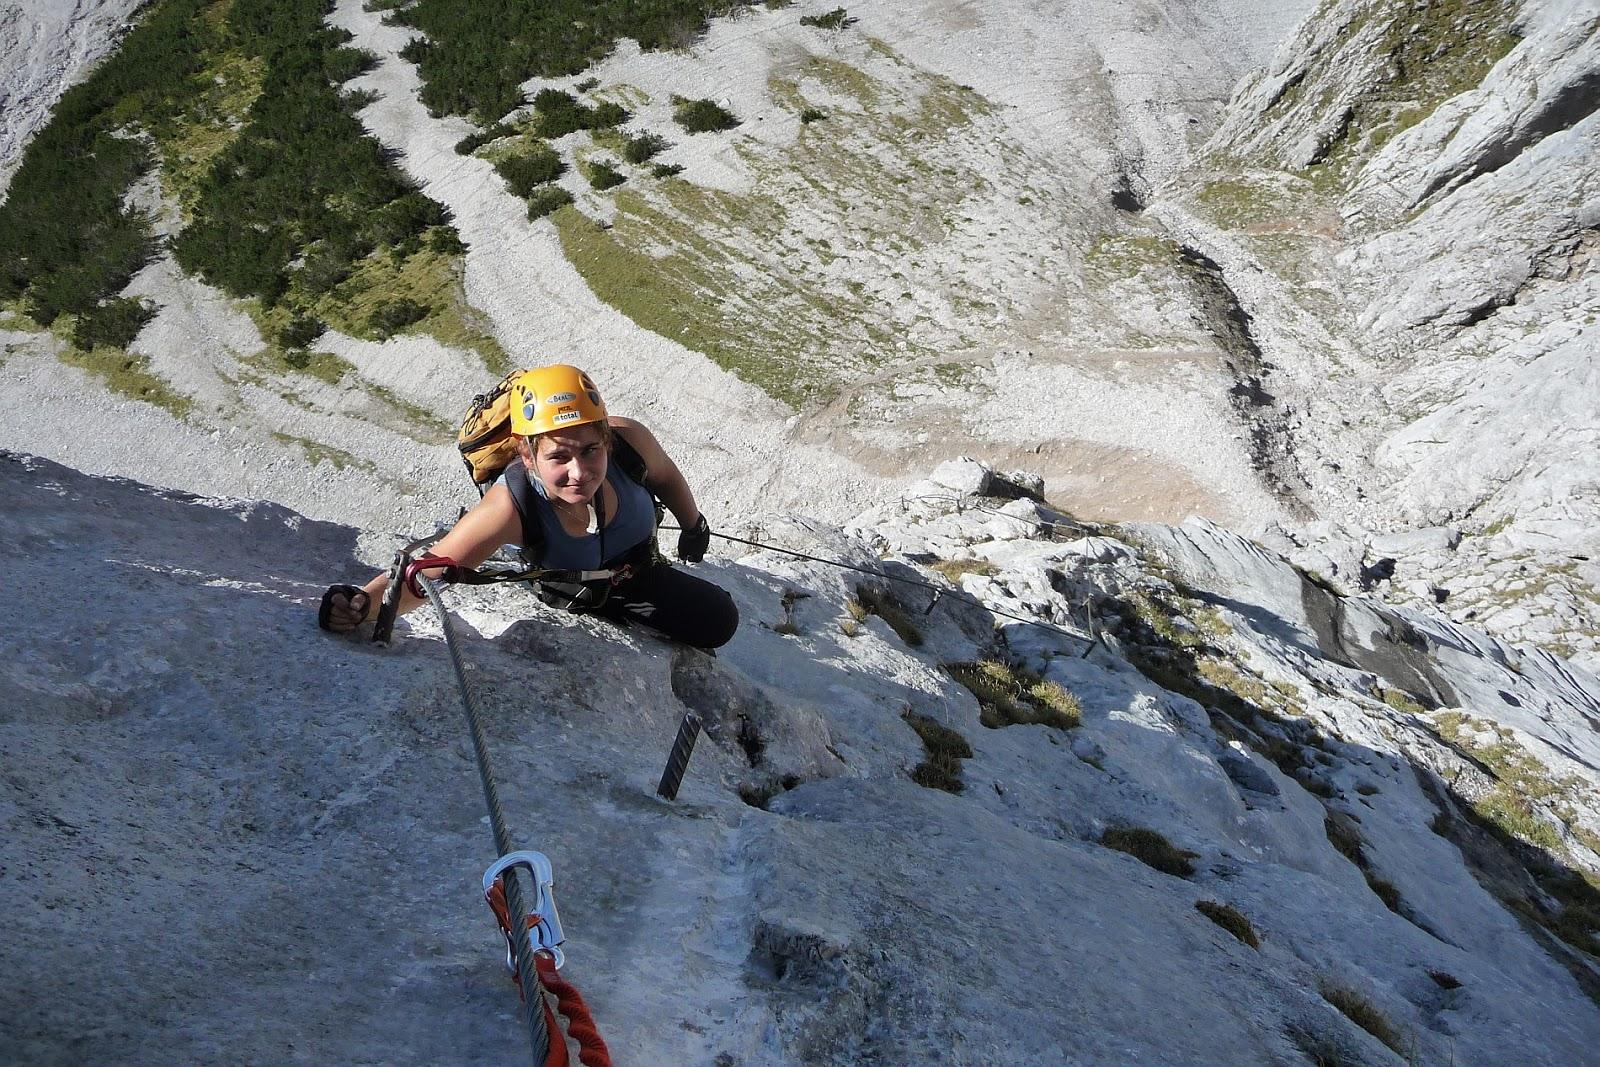 Klettersteig Johann Dachstein : Klettersteig johann: beschreibung anna.